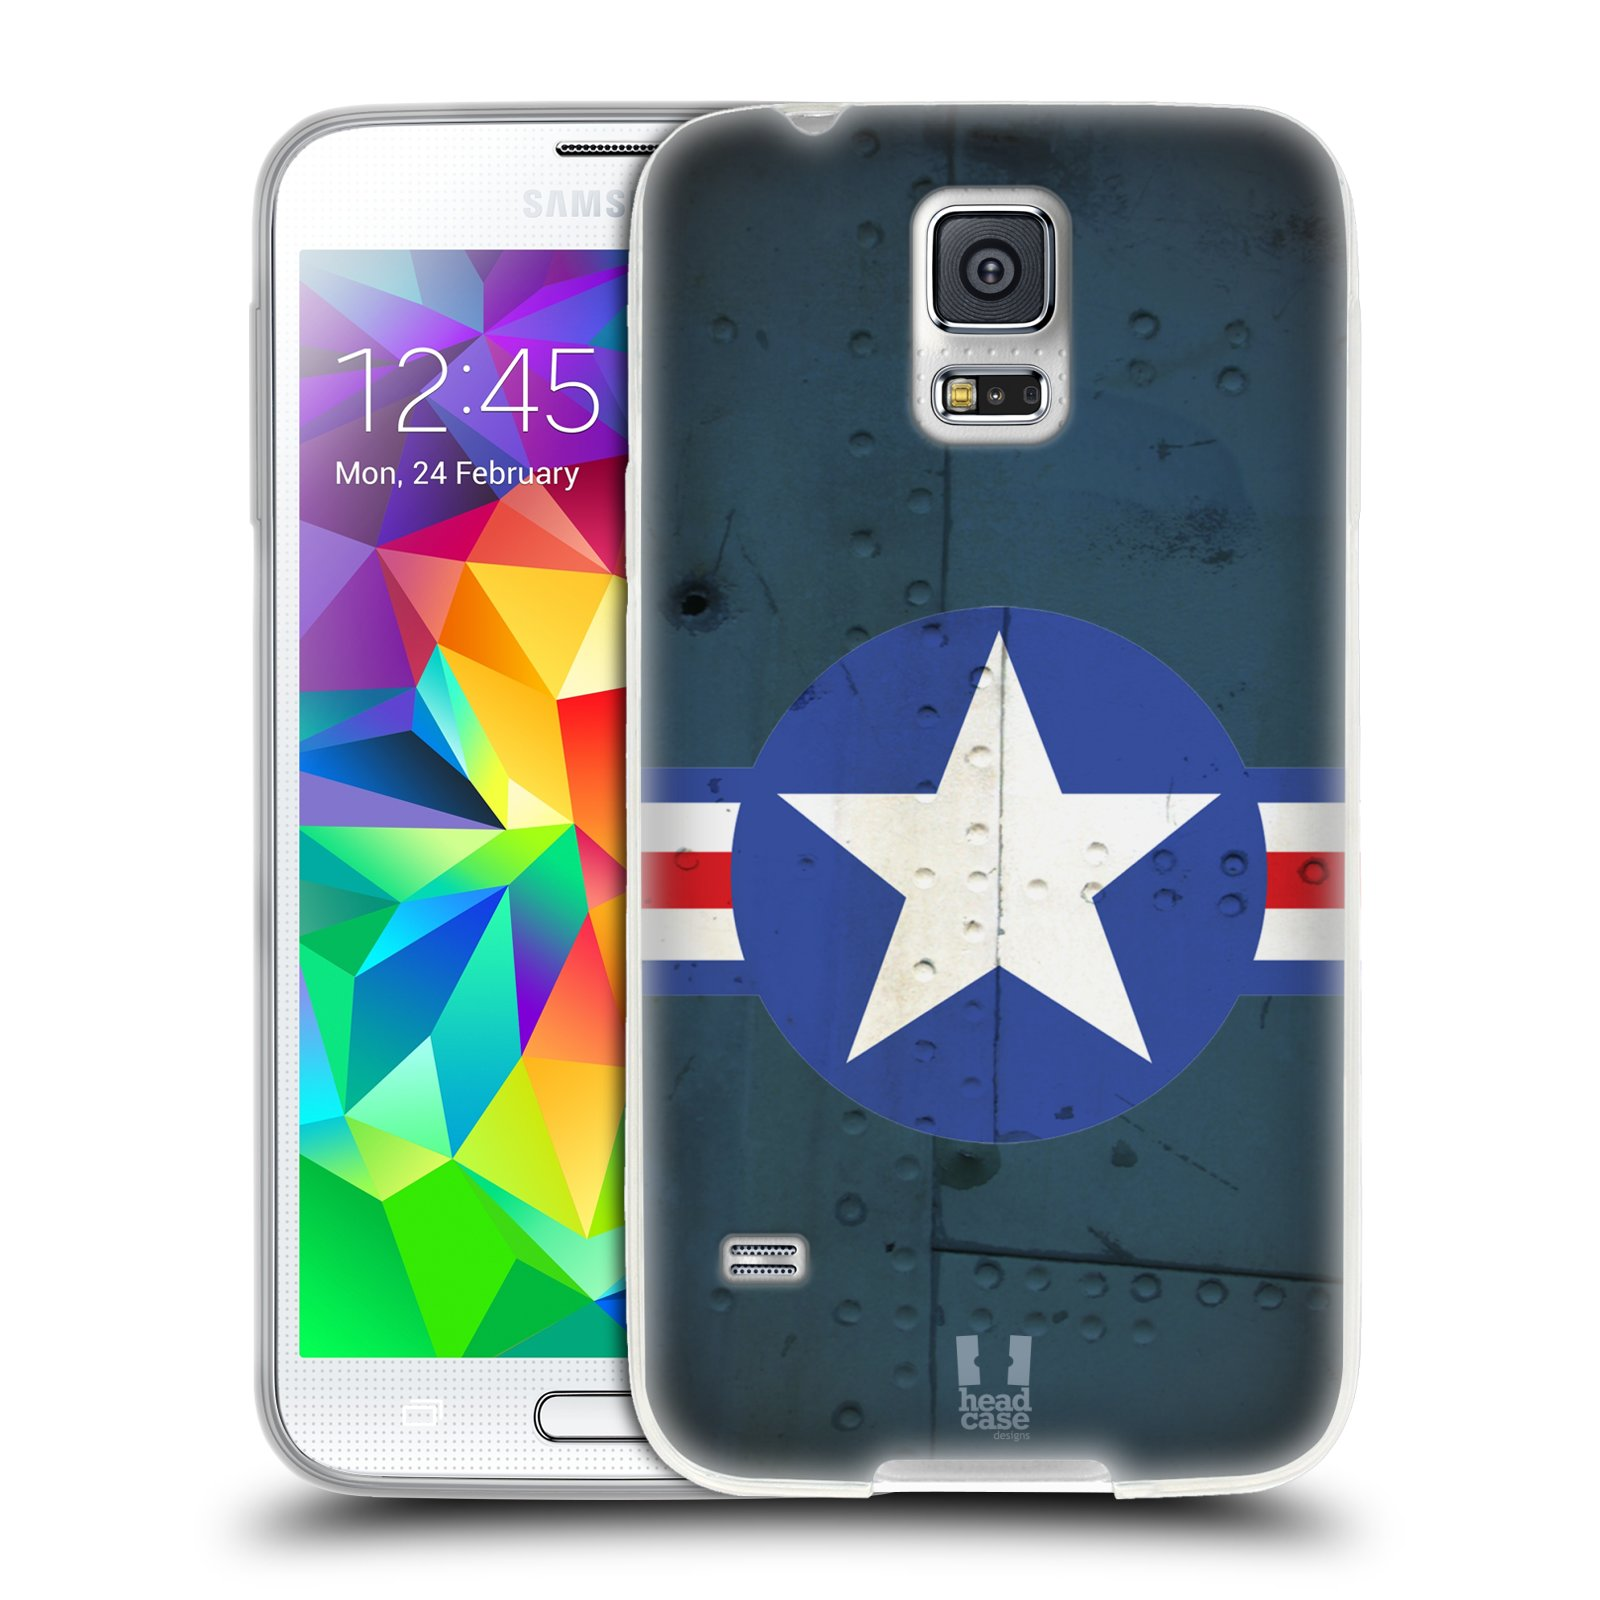 Silikonové pouzdro na mobil Samsung Galaxy S5 HEAD CASE POSTWAR (Silikonový kryt či obal na mobilní telefon Samsung Galaxy S5 SM-G900F)